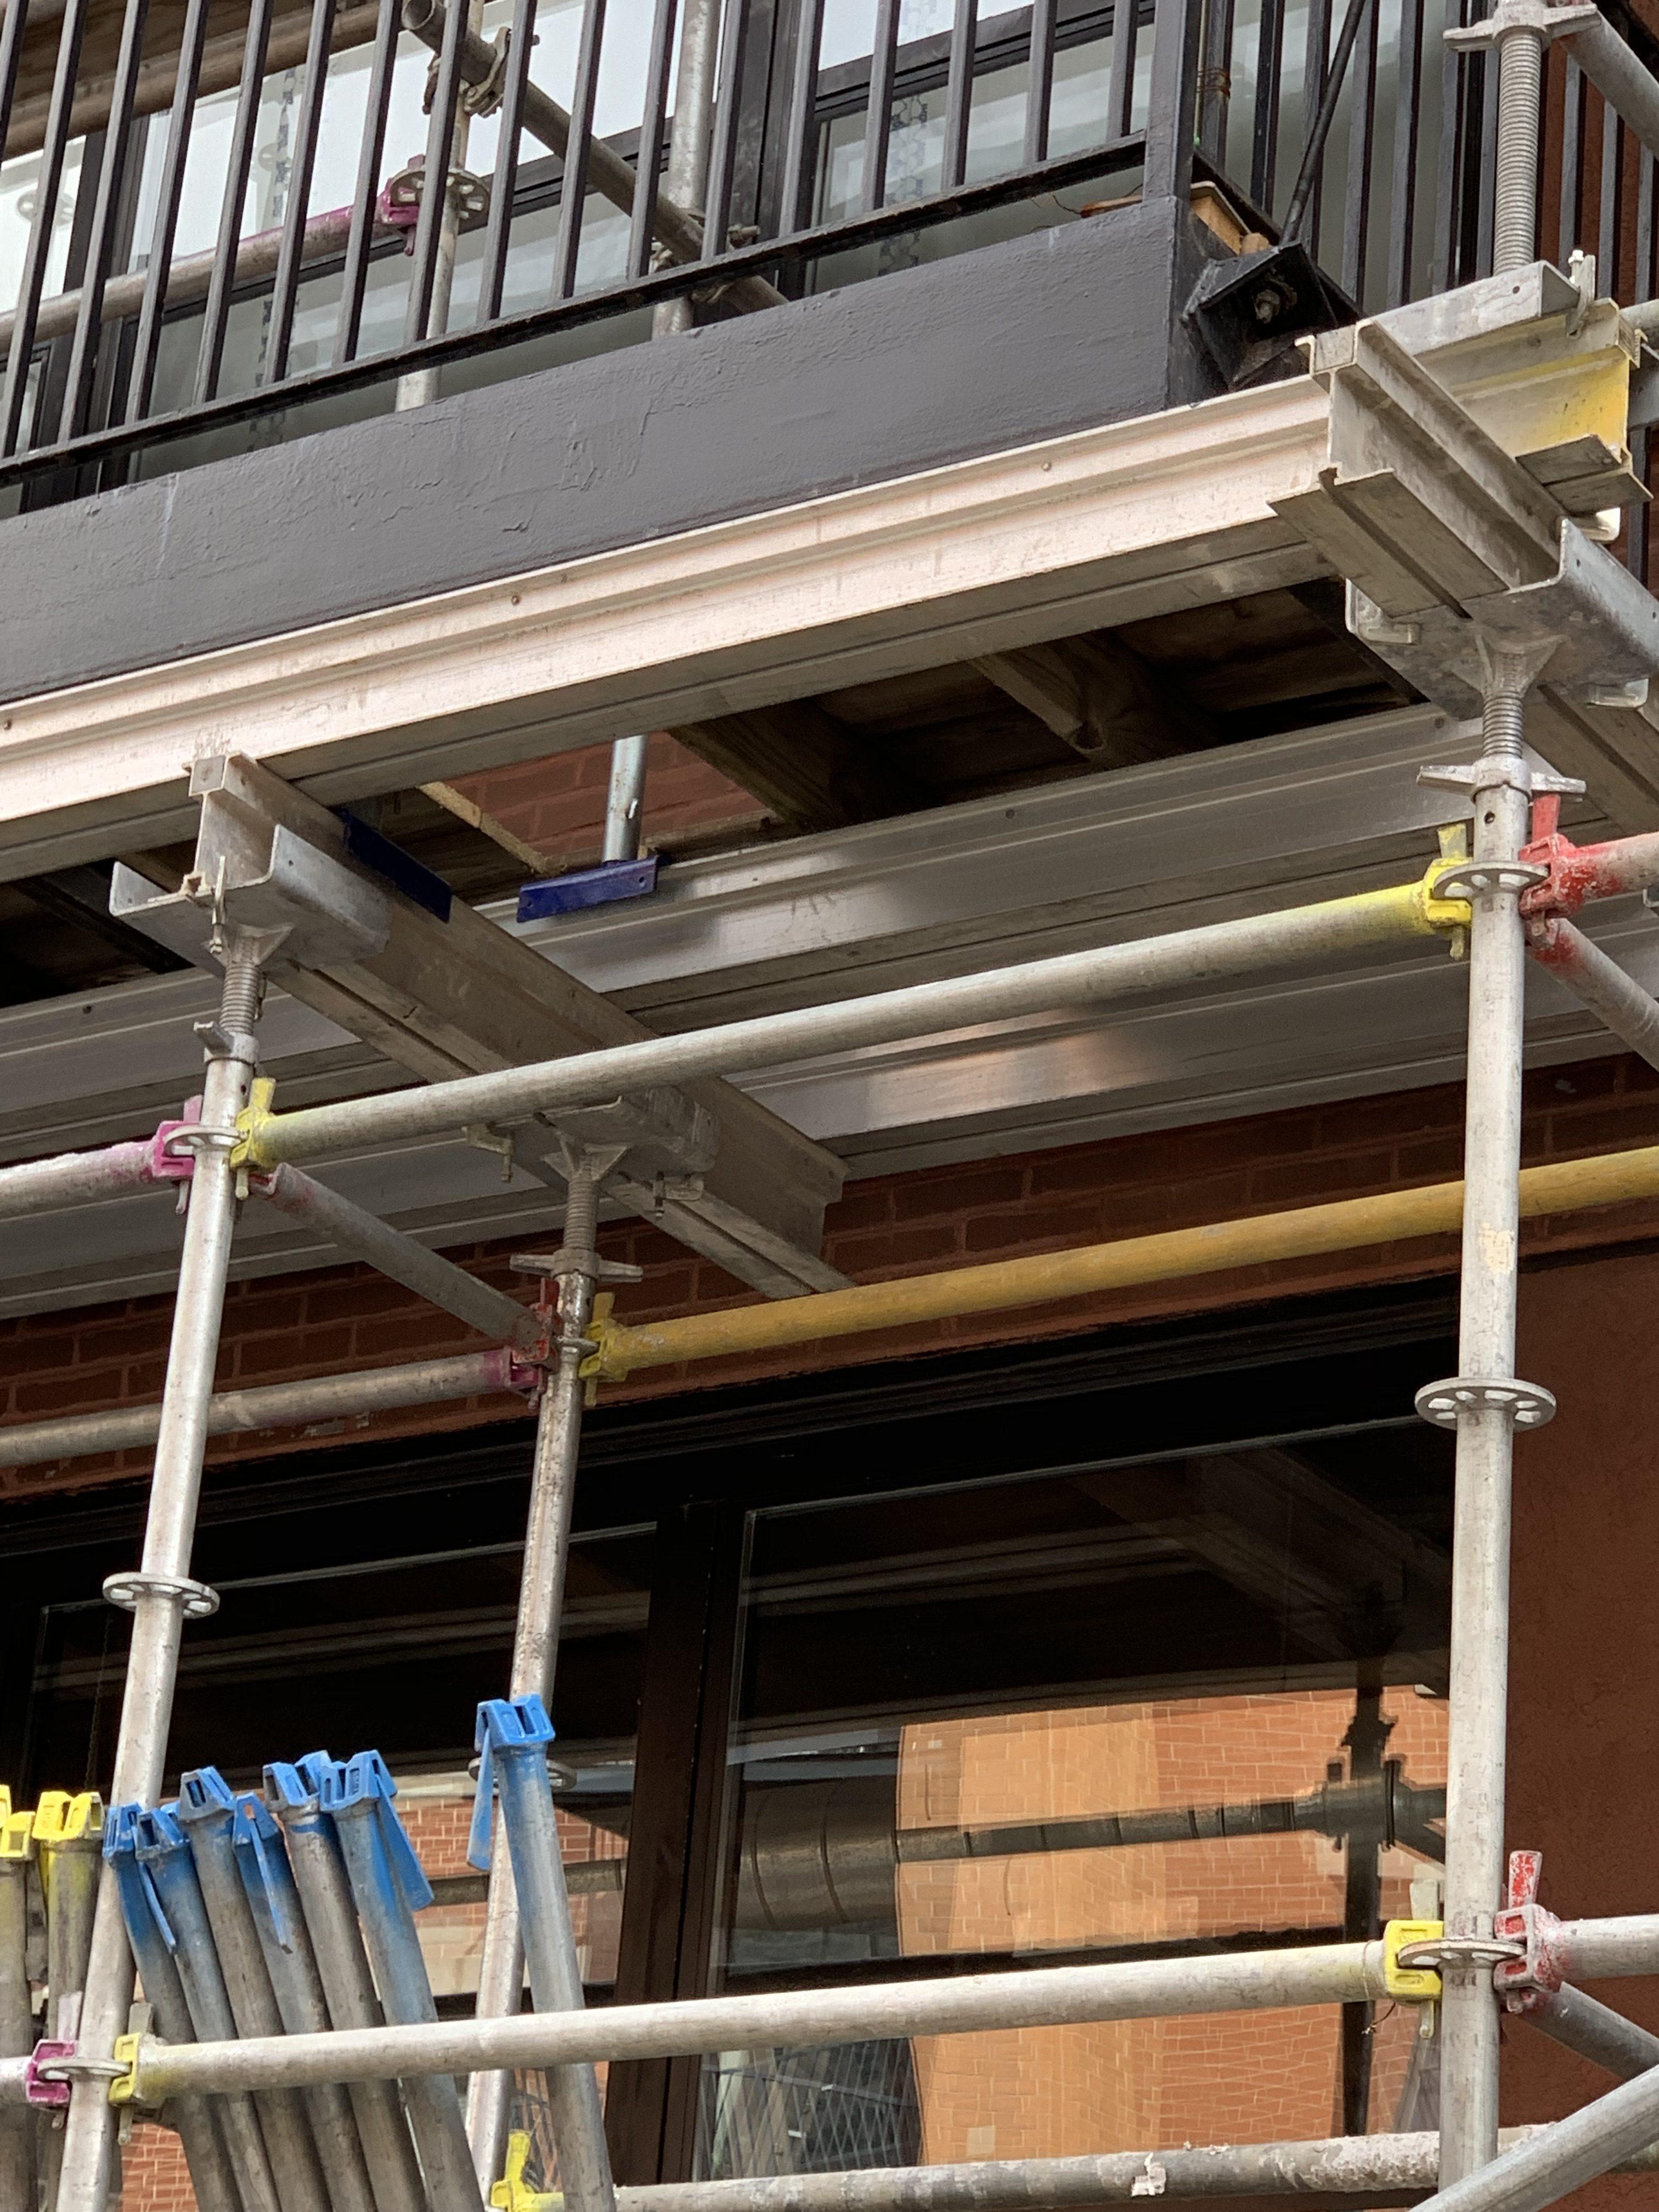 541 W. Fulton - Shoring & Tower scaffold 3